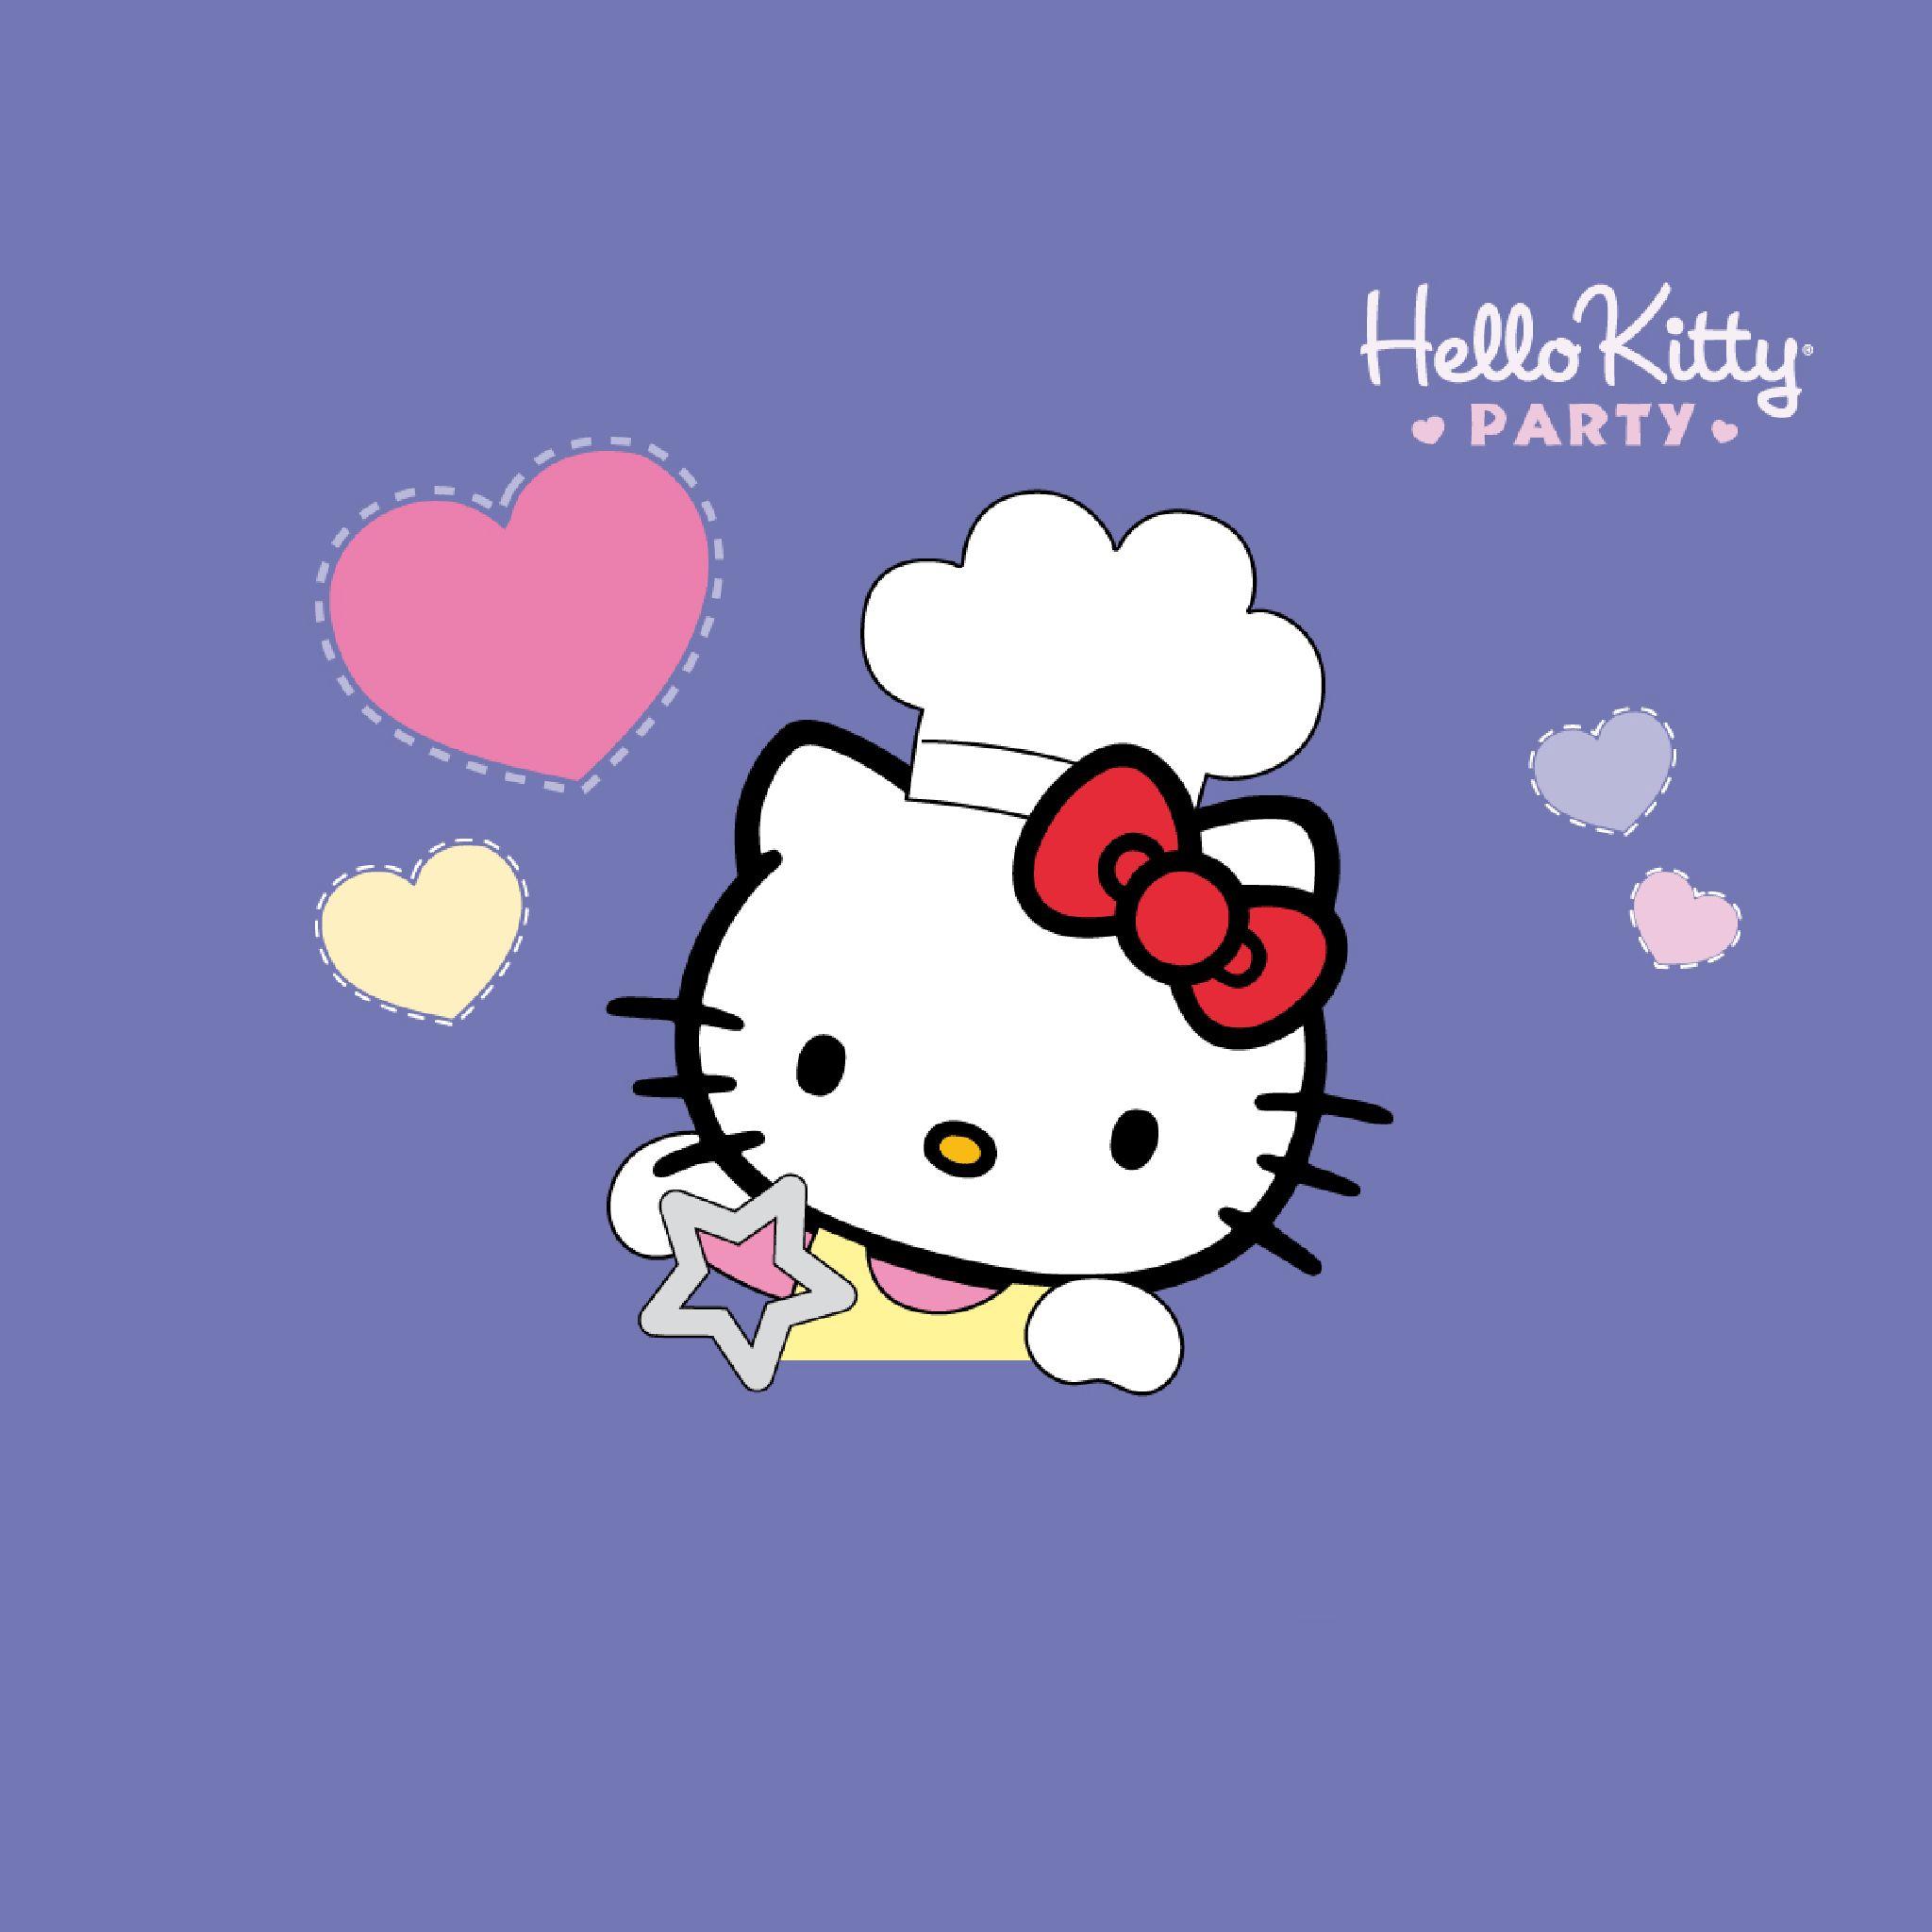 Pin By Terra Thayer On Hello Kitty Hello Kitty Pictures Hello Kitty Hello Kitty Art